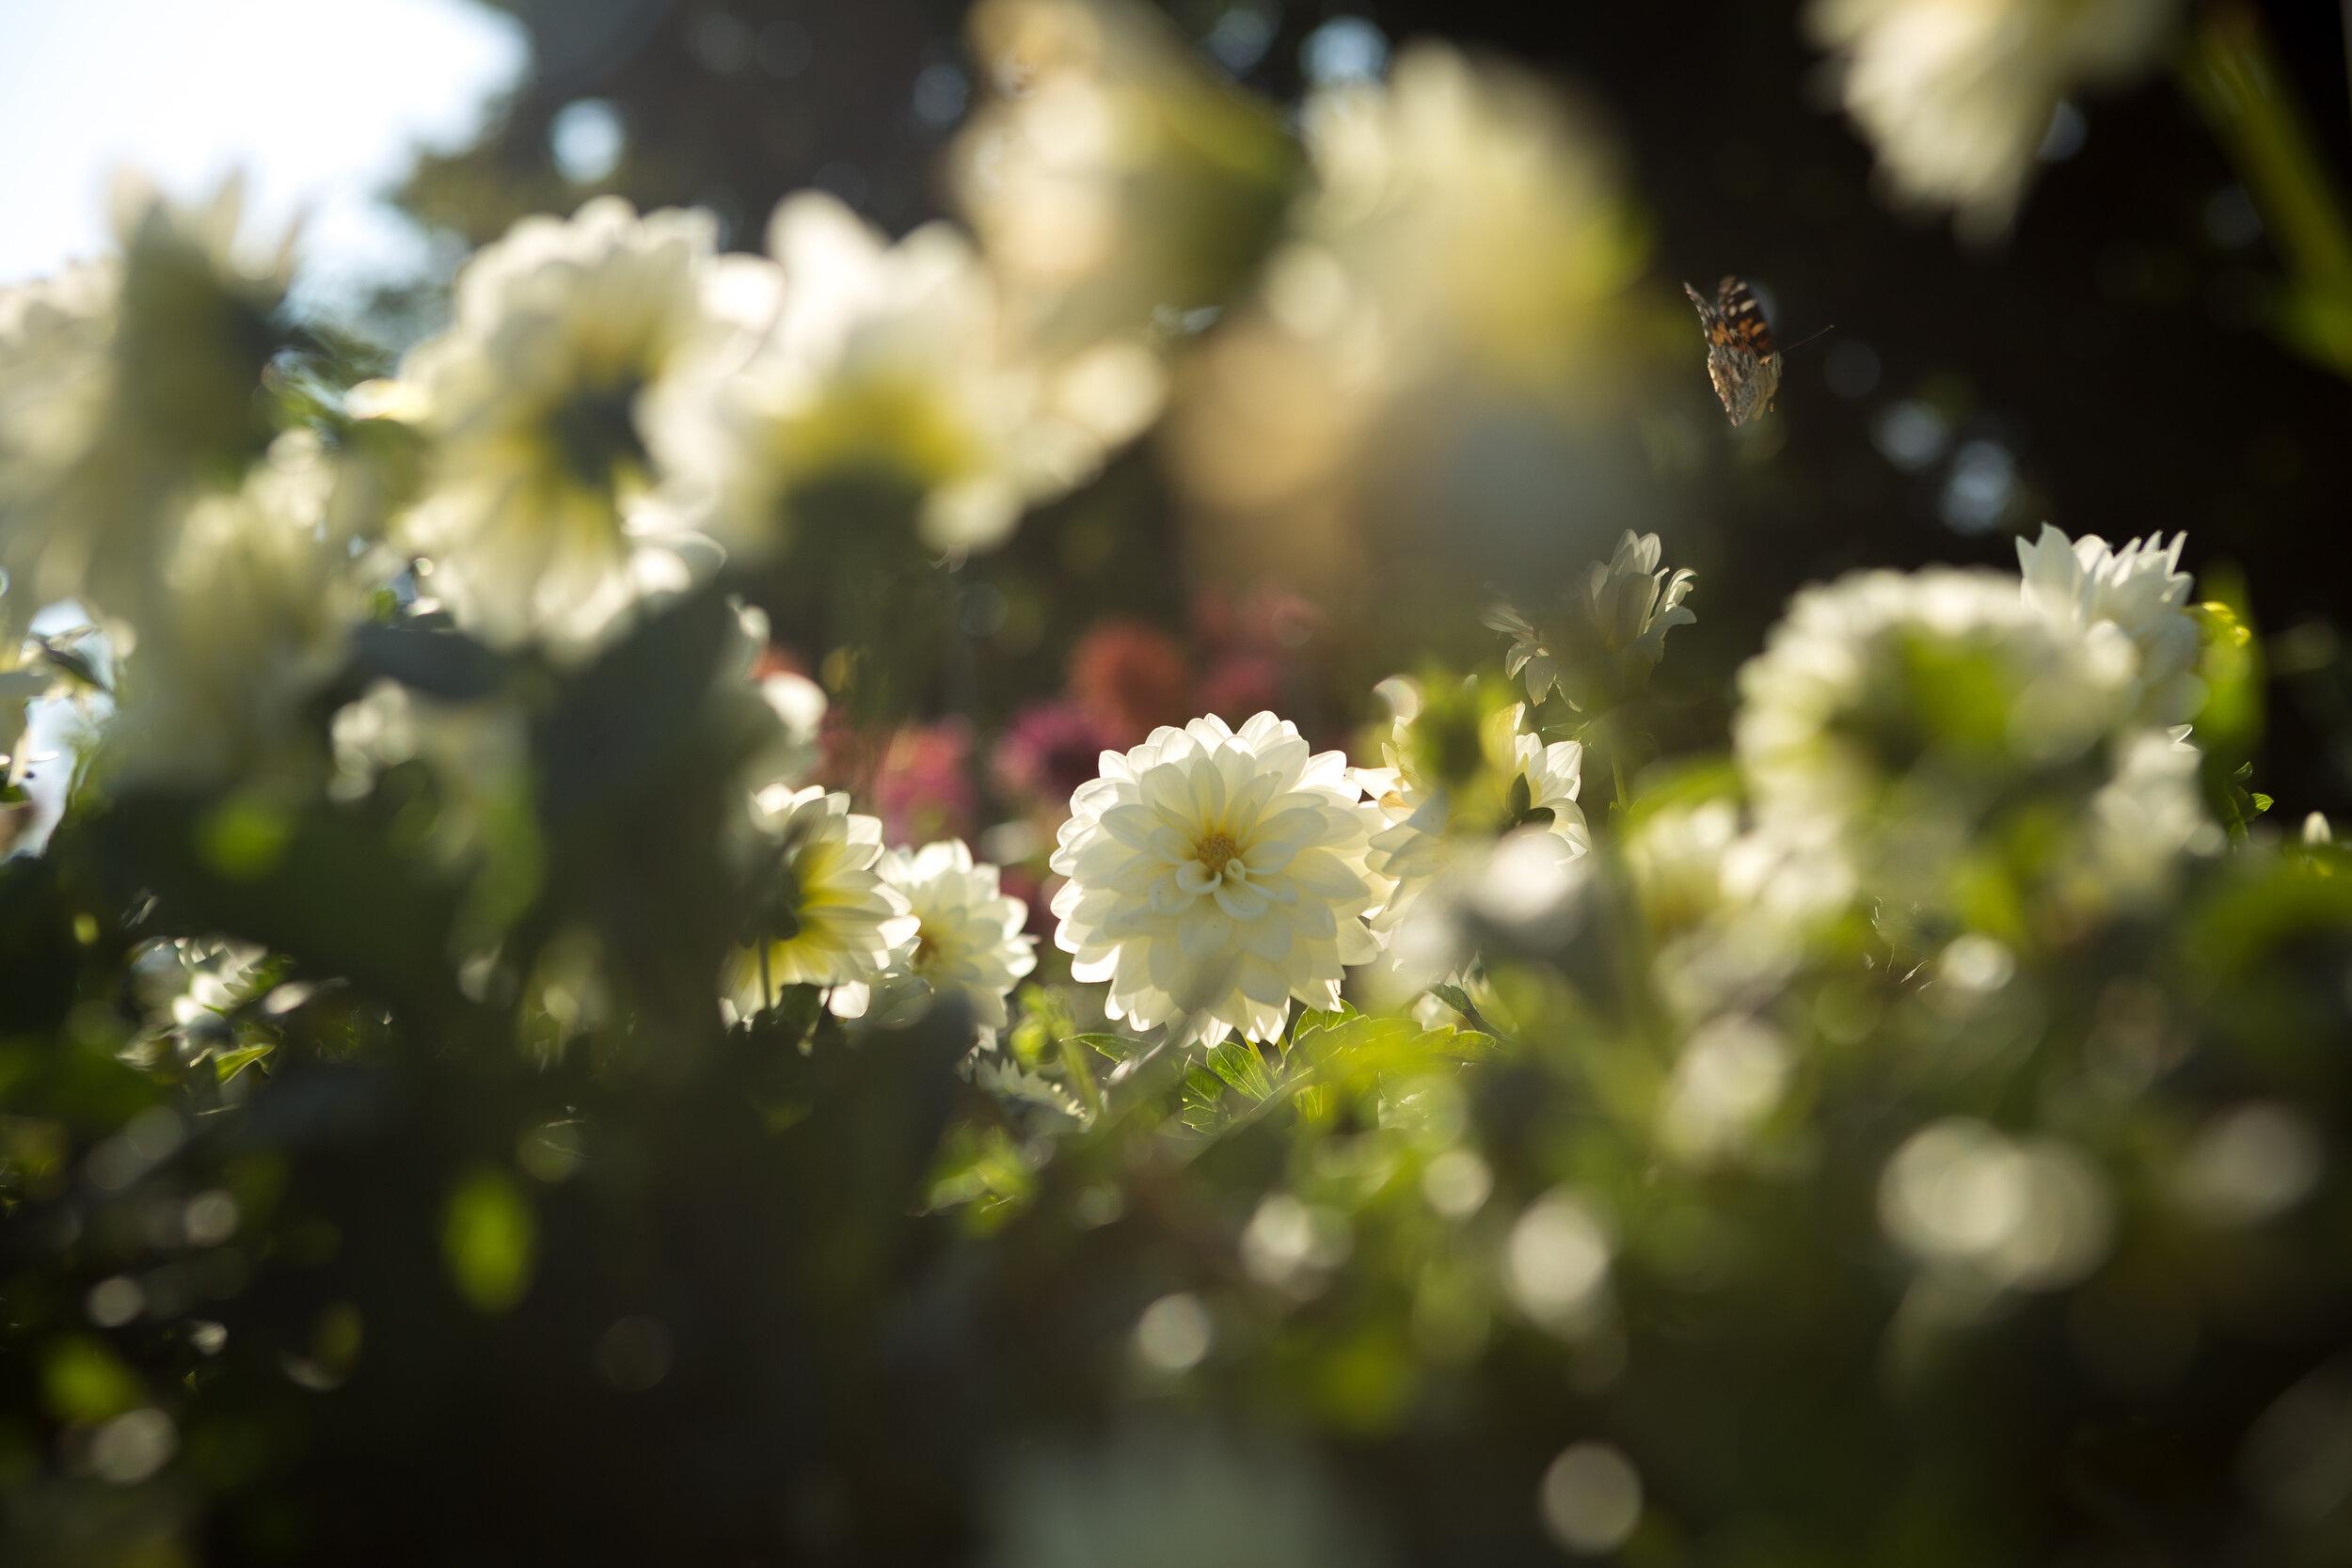 Dahlia Garden Shining Bright